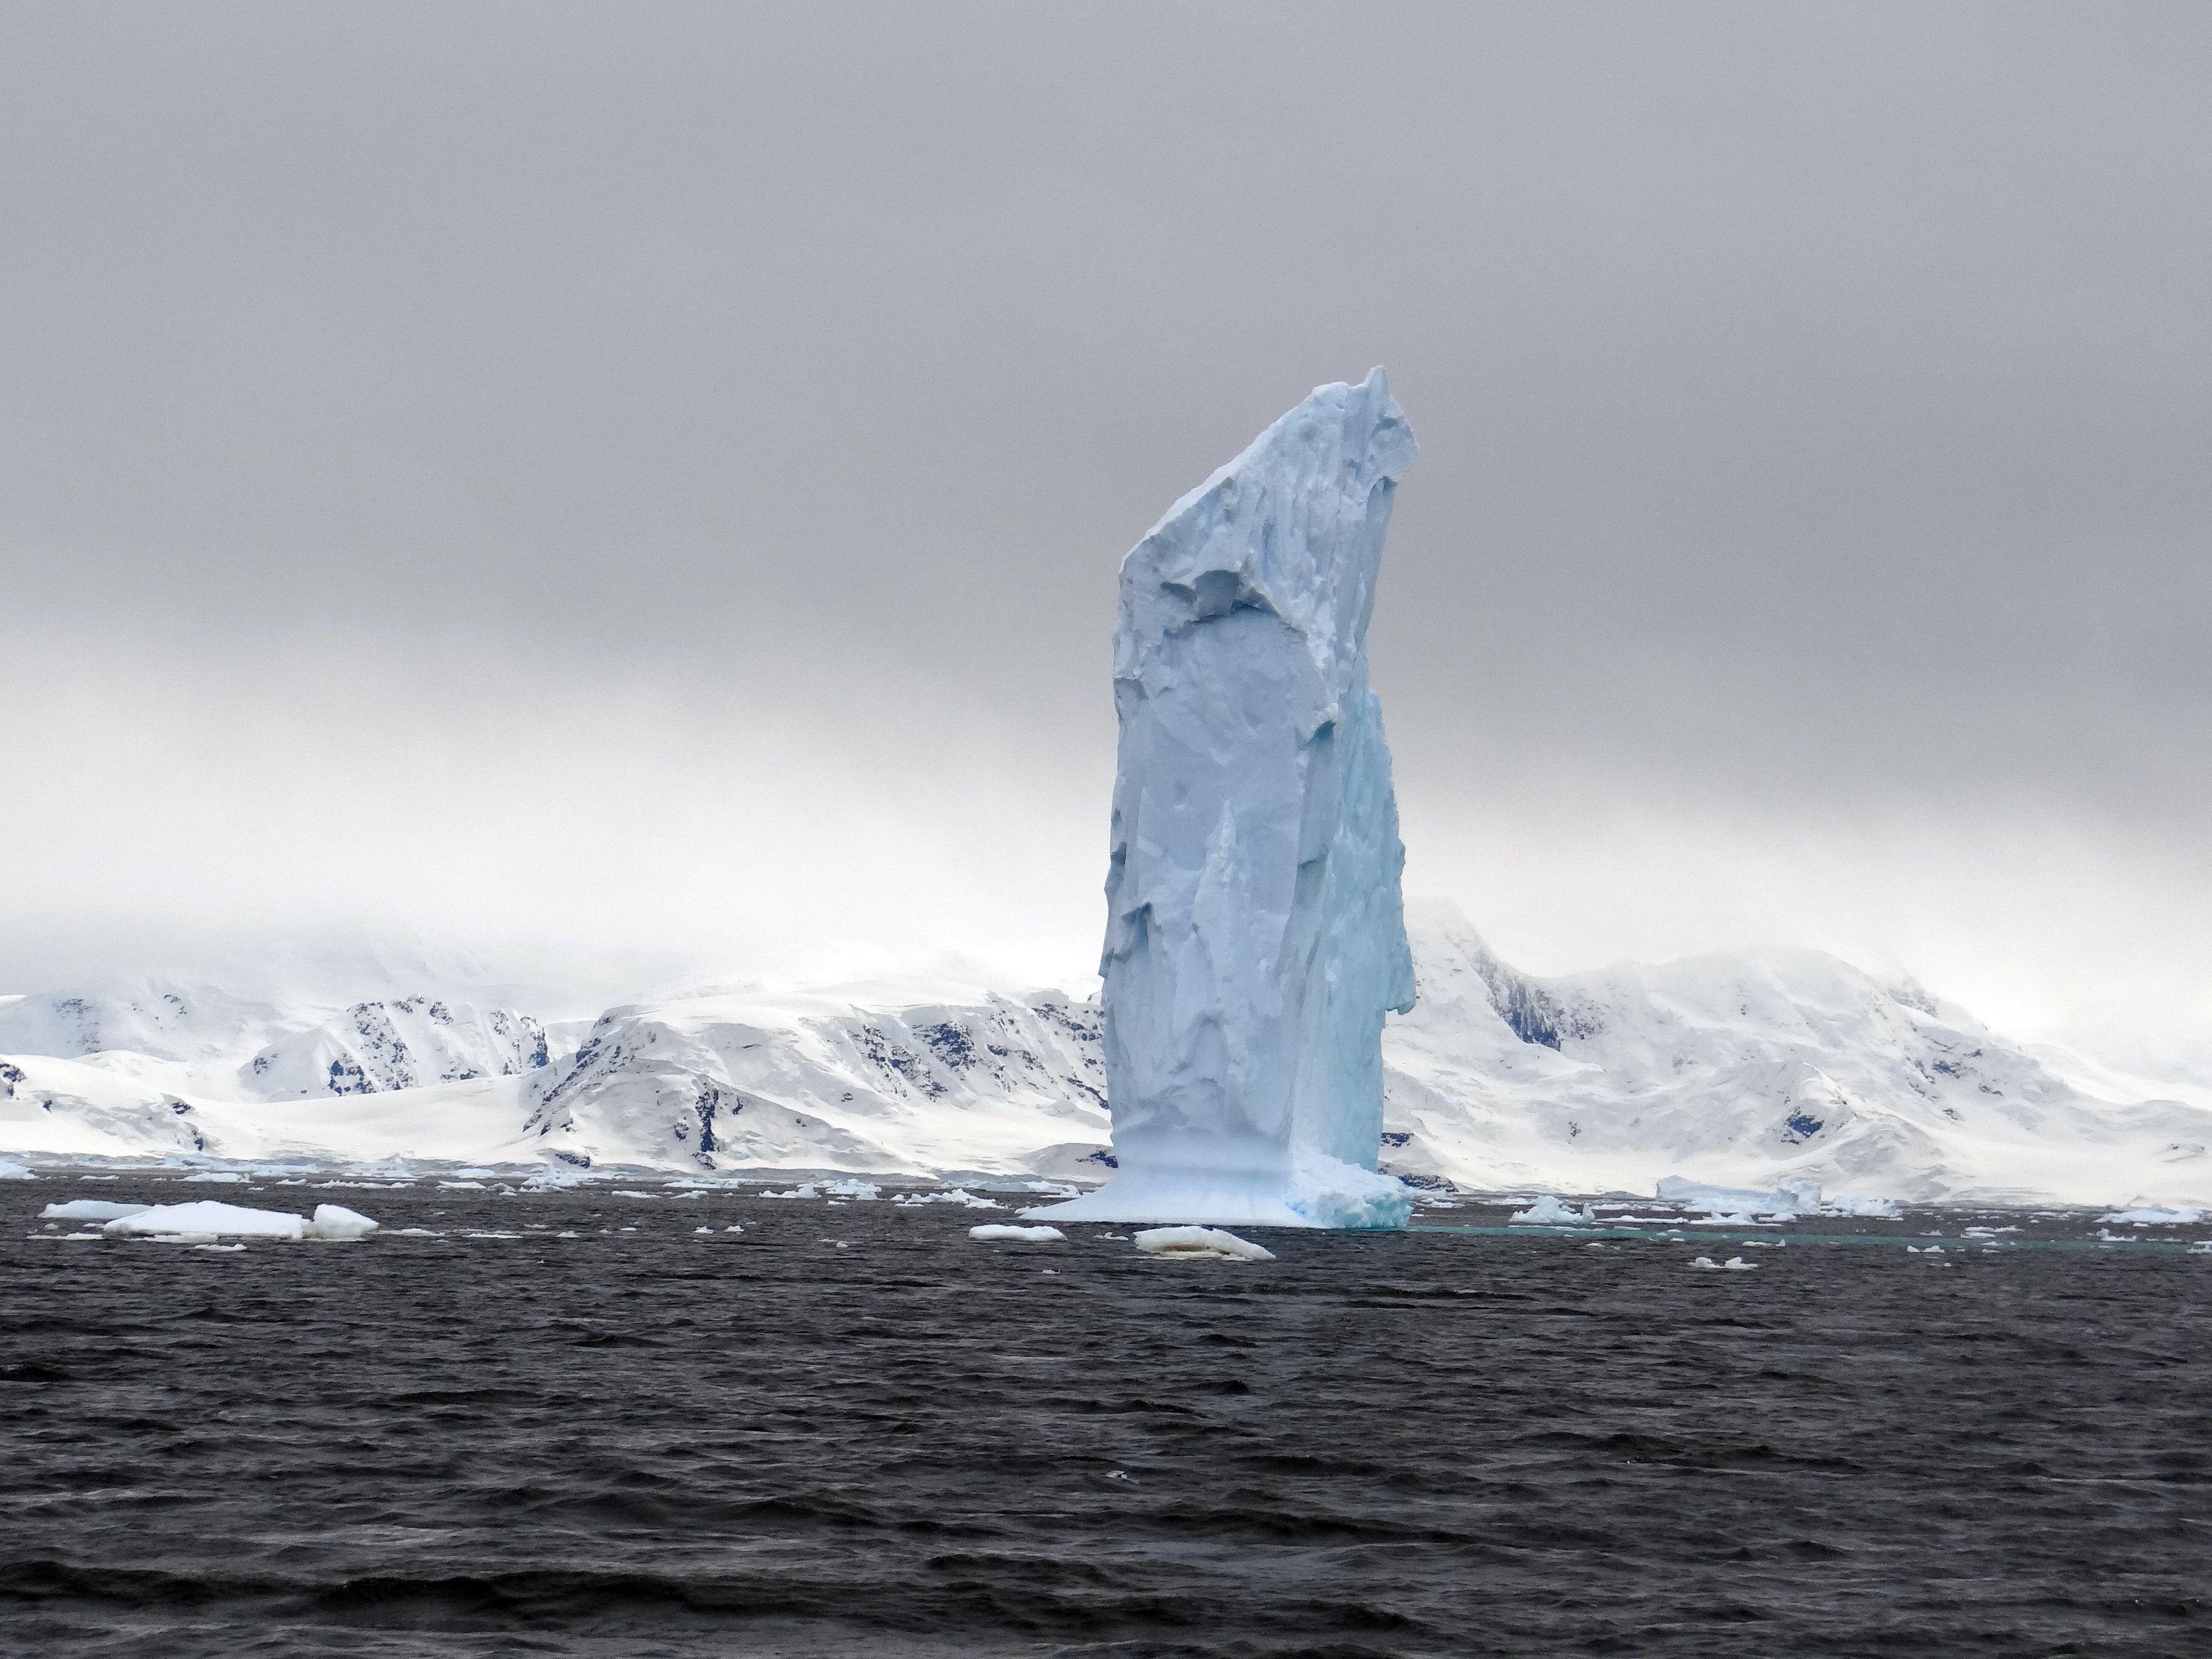 Giant iceberg in Antarctica